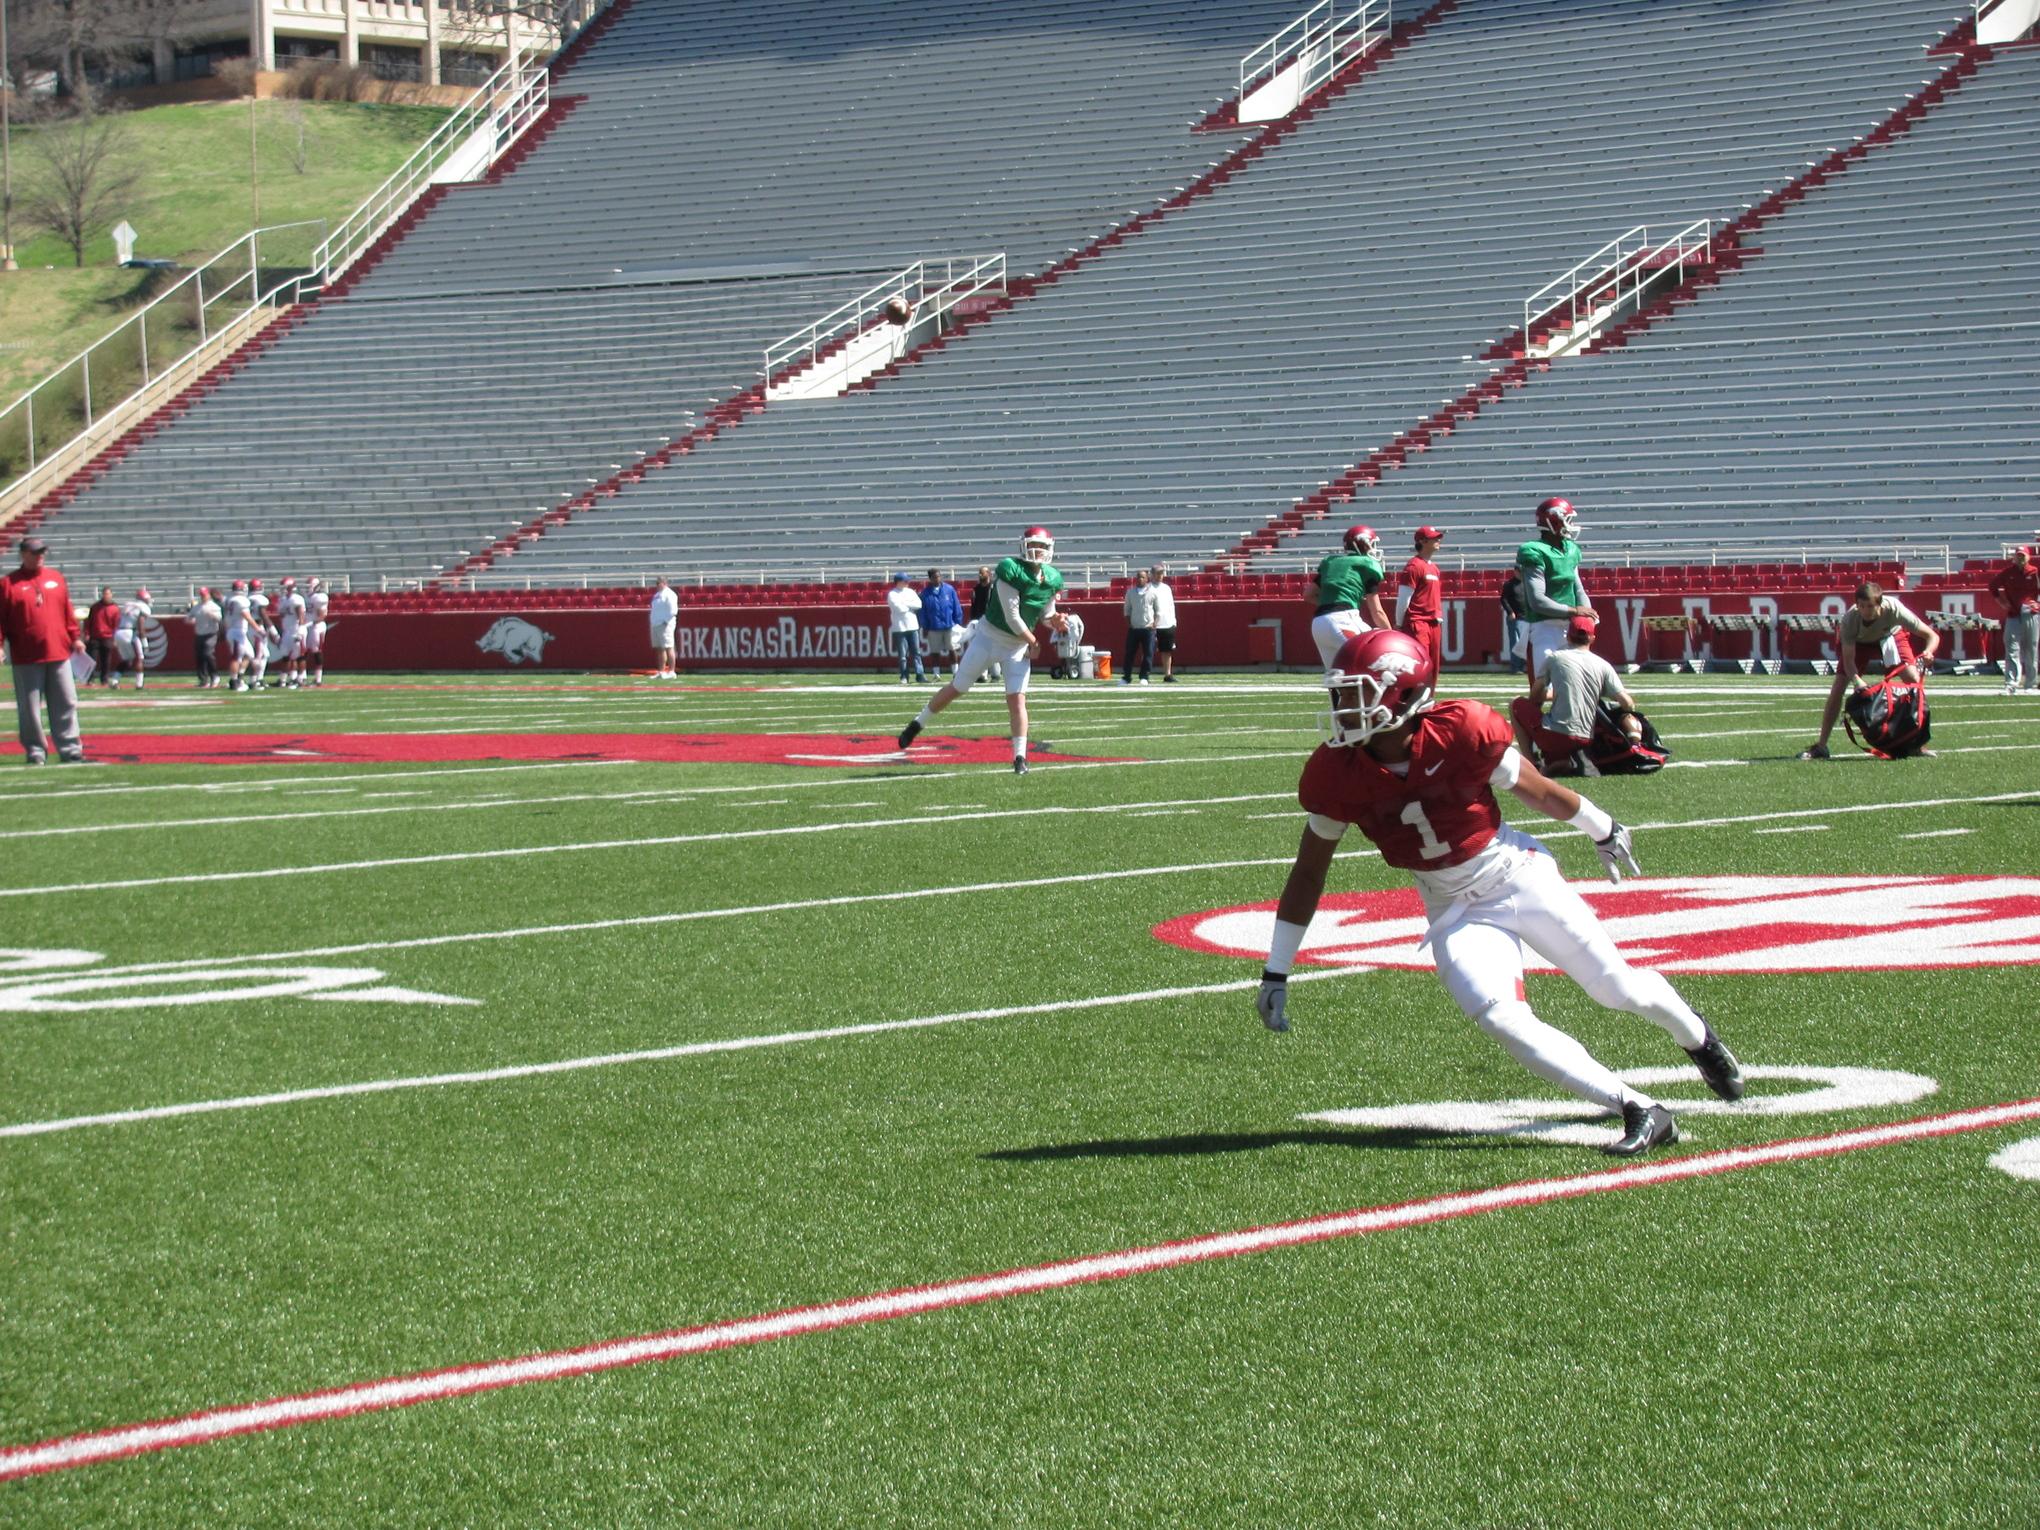 Jared Cornelius catching passes at Arkansas' scrimmage on April 5th, 2014